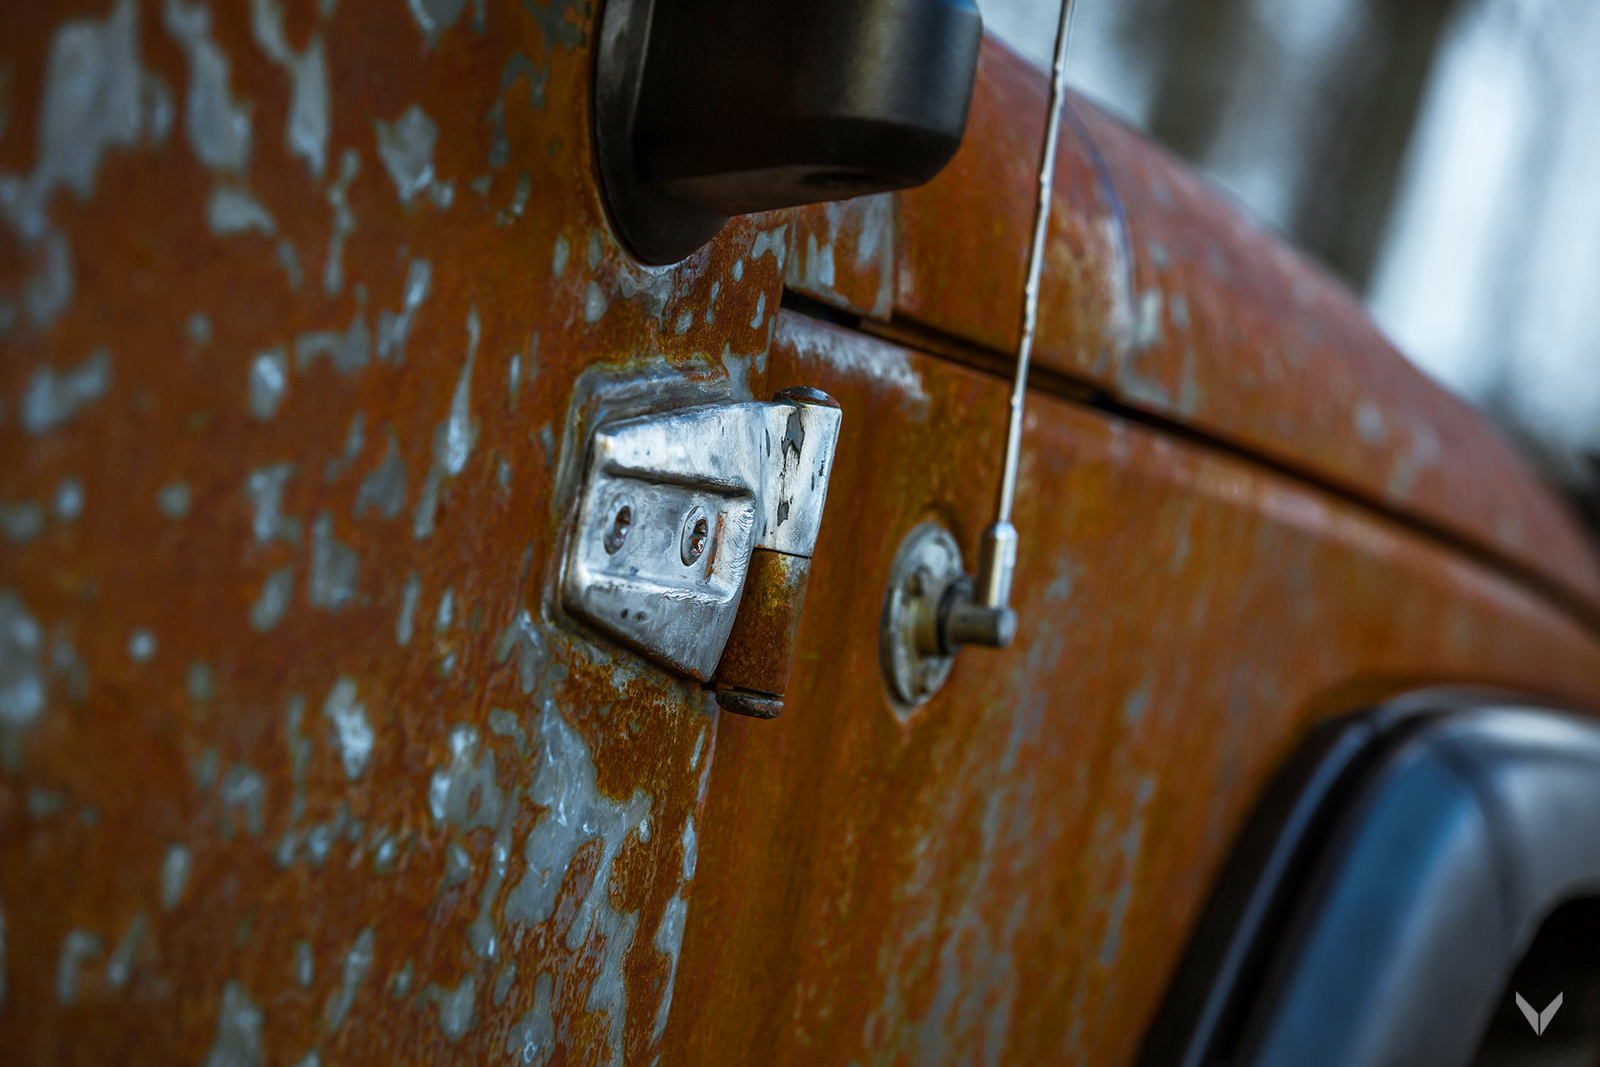 Jeep Wrangler Hunting Unlimited by Vilner (3)